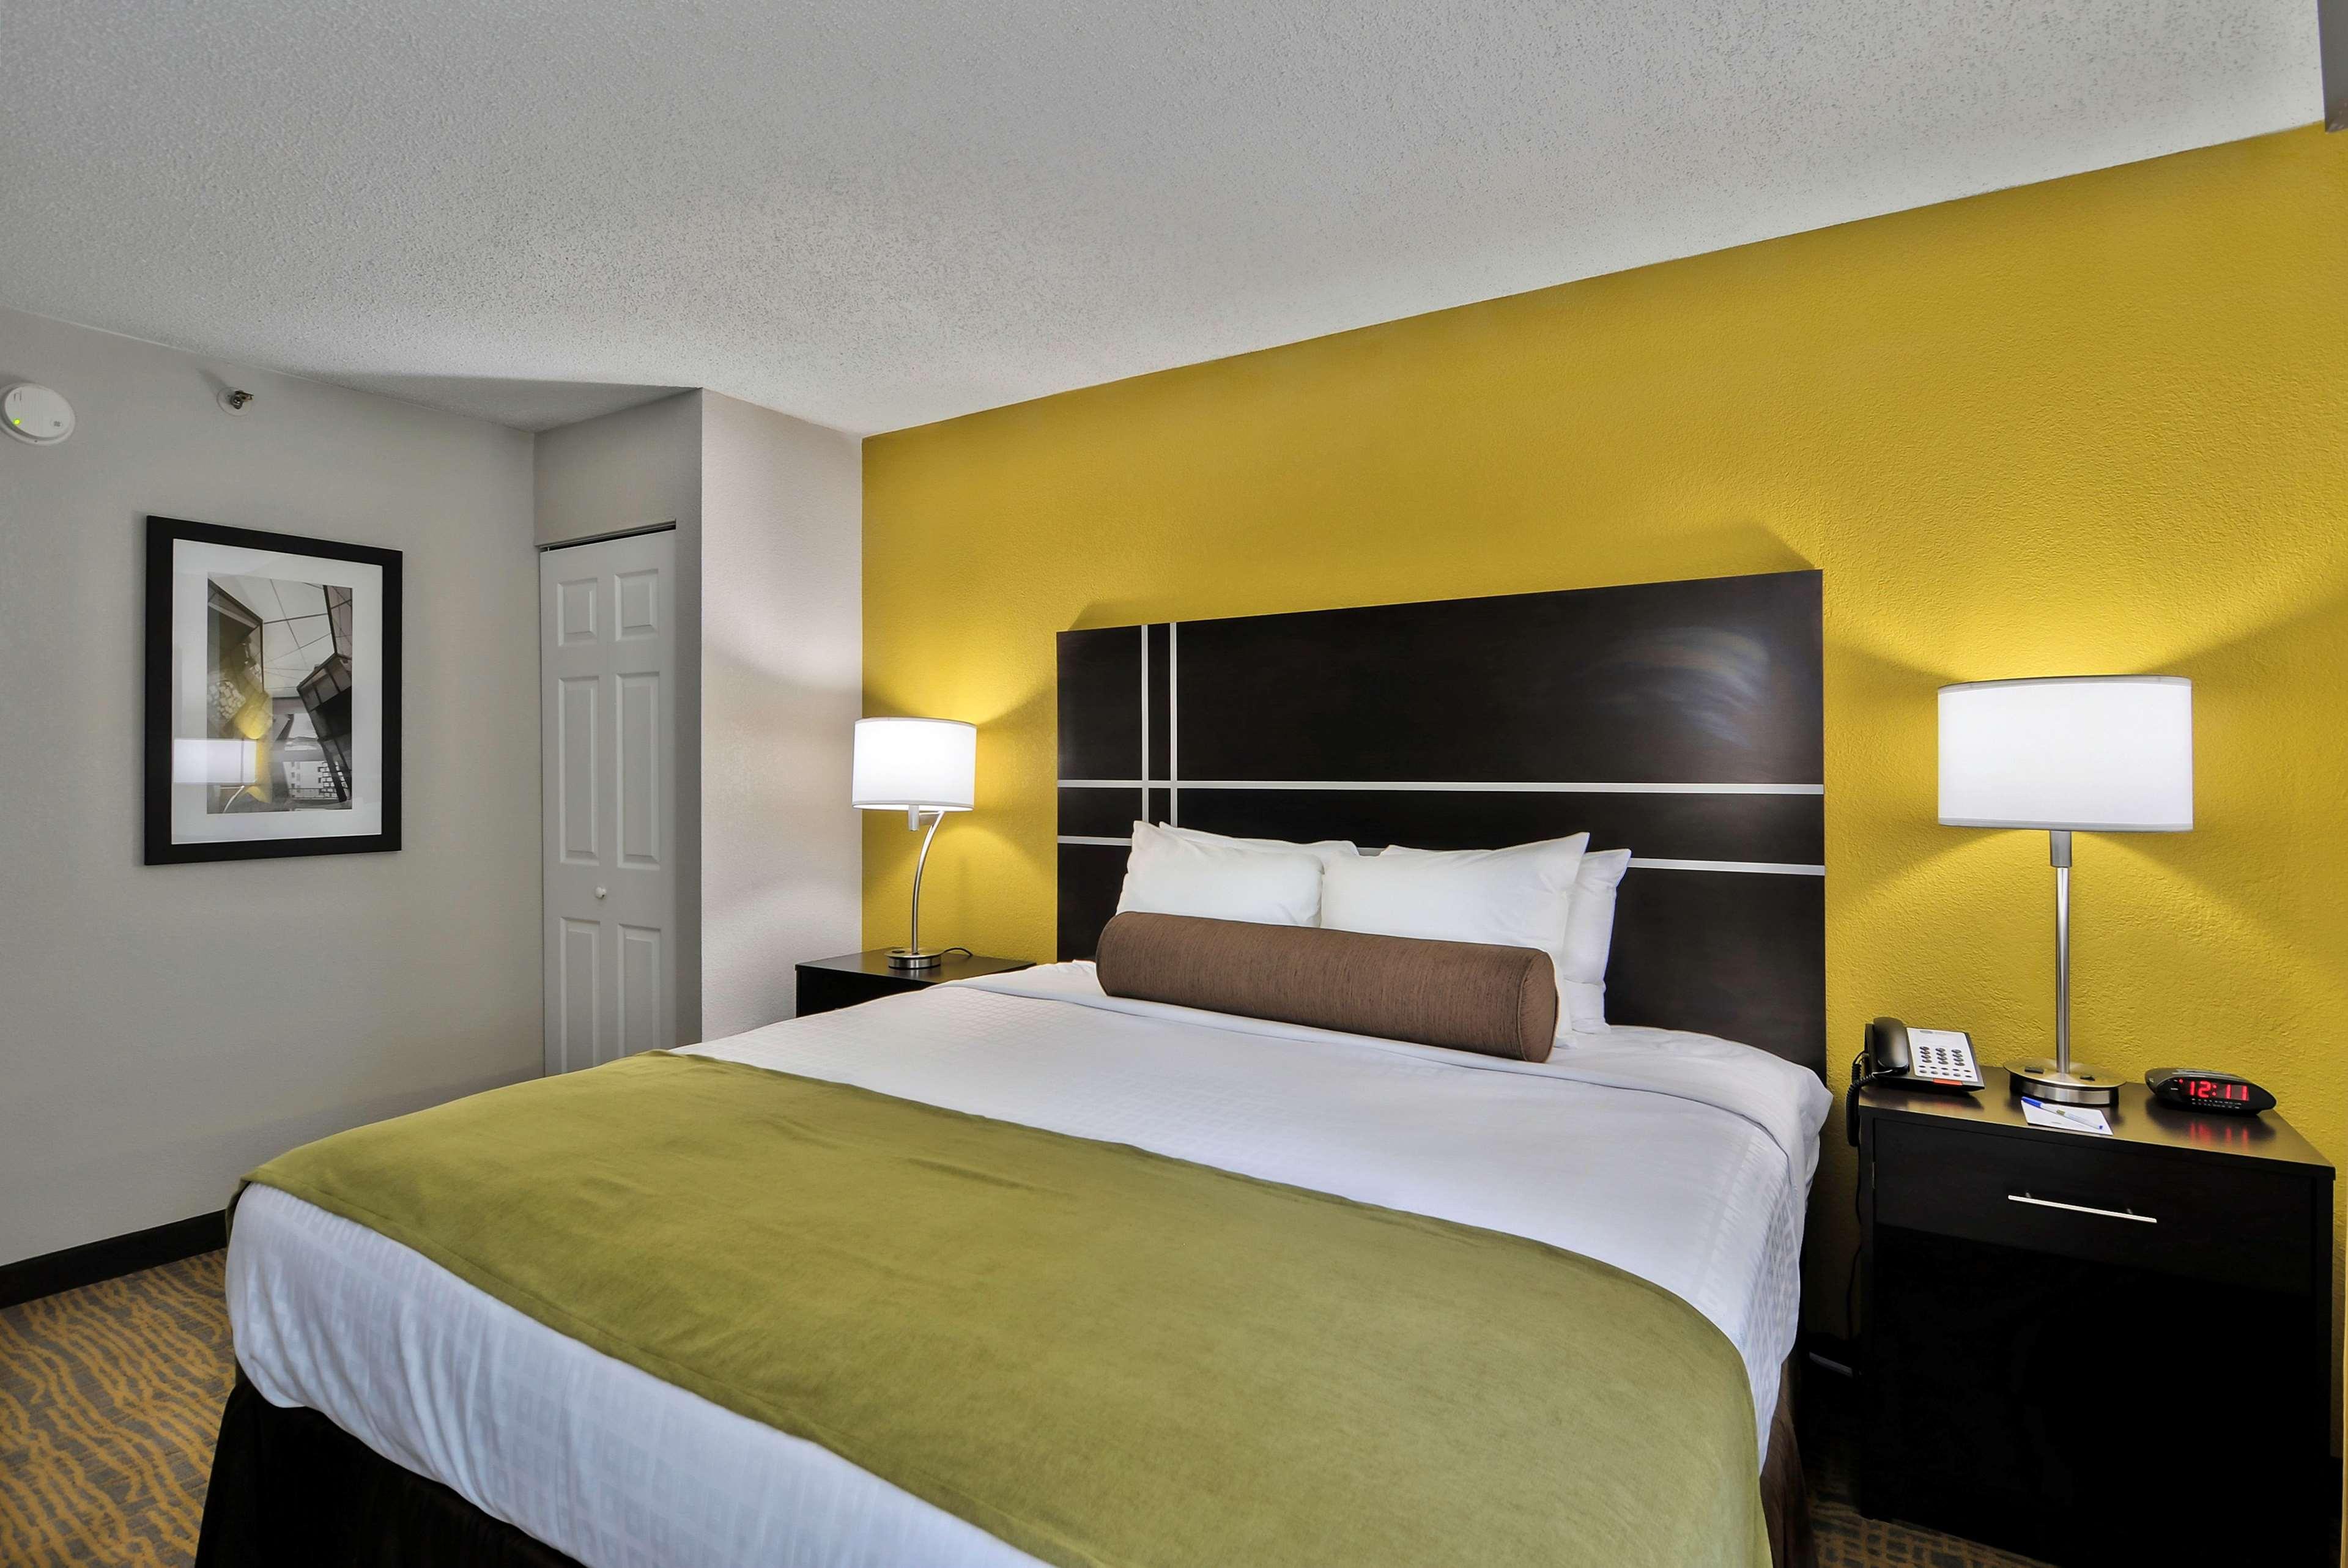 Best Western Hotel Winston Salem Nc